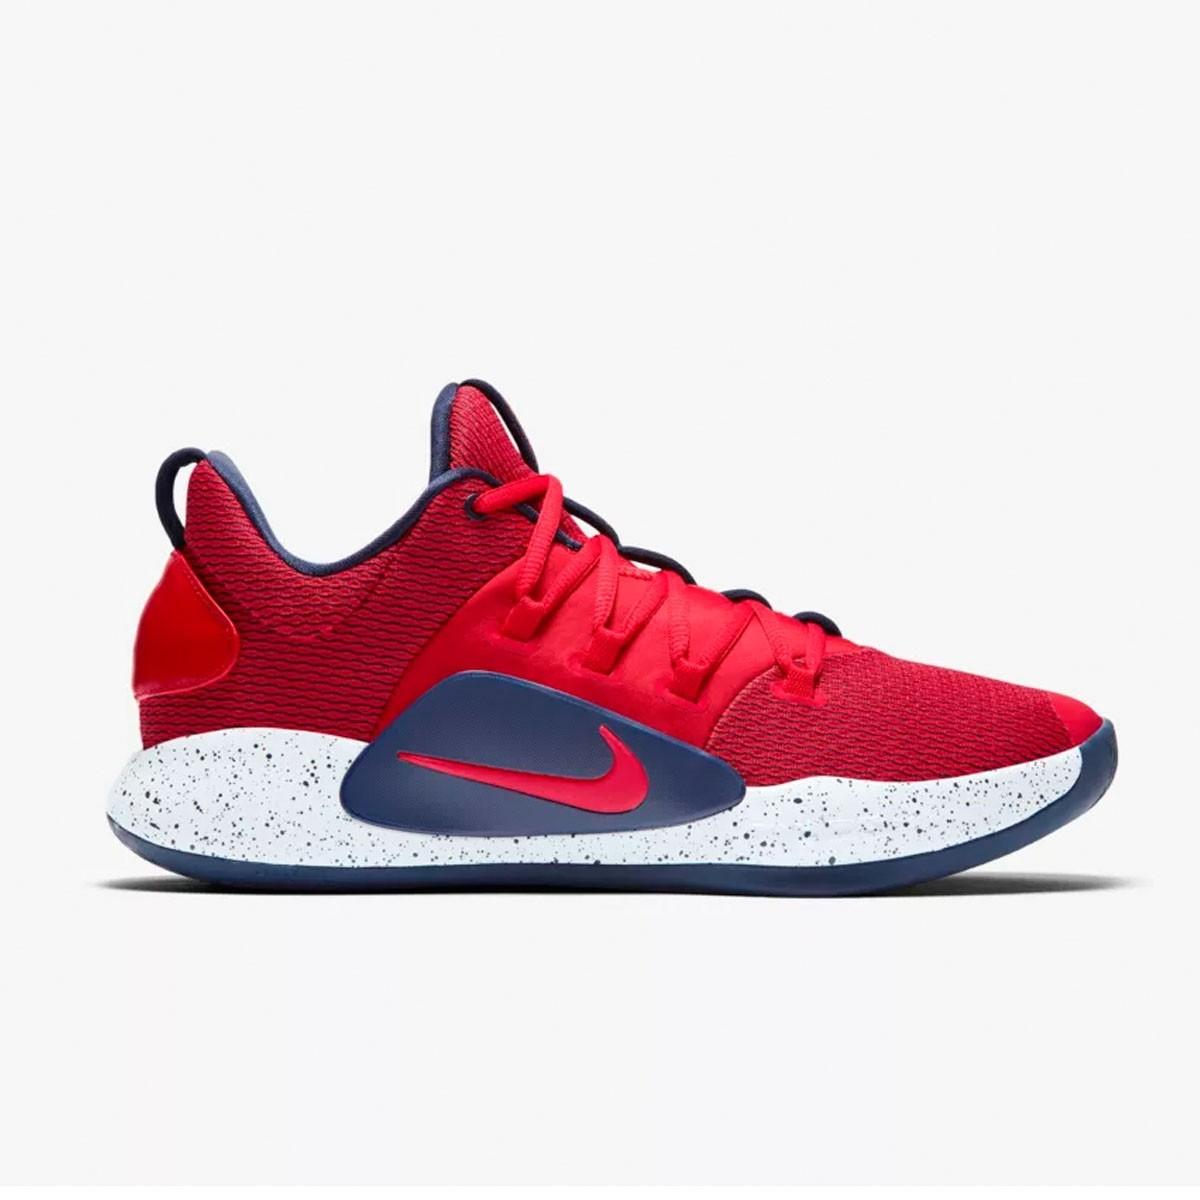 Nike Hyperdunk X Low 2018 'Red Navy'